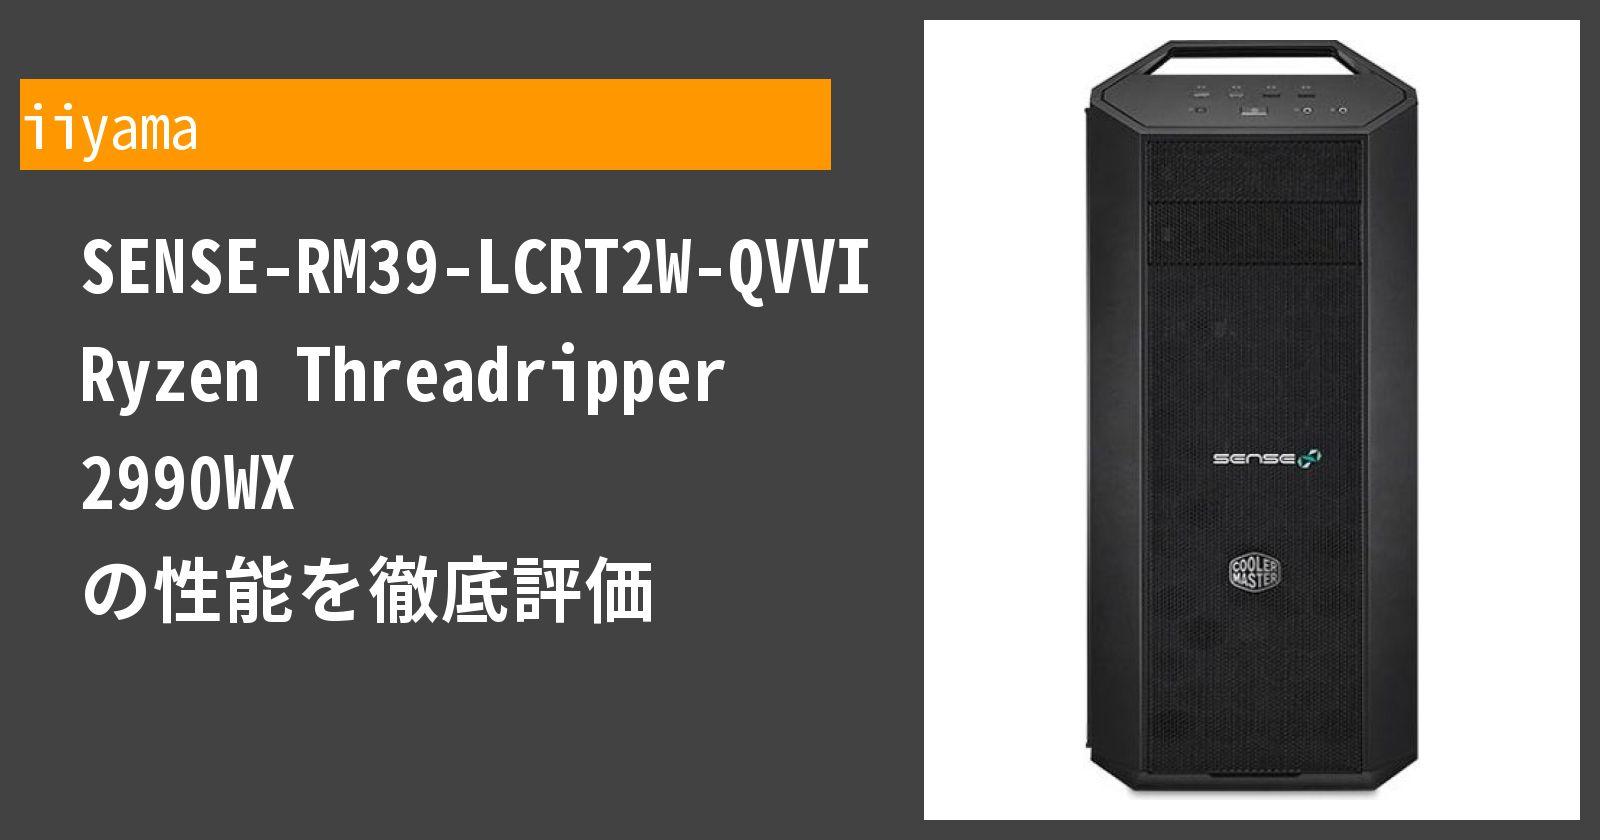 SENSE-RM39-LCRT2W-QVVI Ryzen Threadripper 2990WX の性能を徹底評価